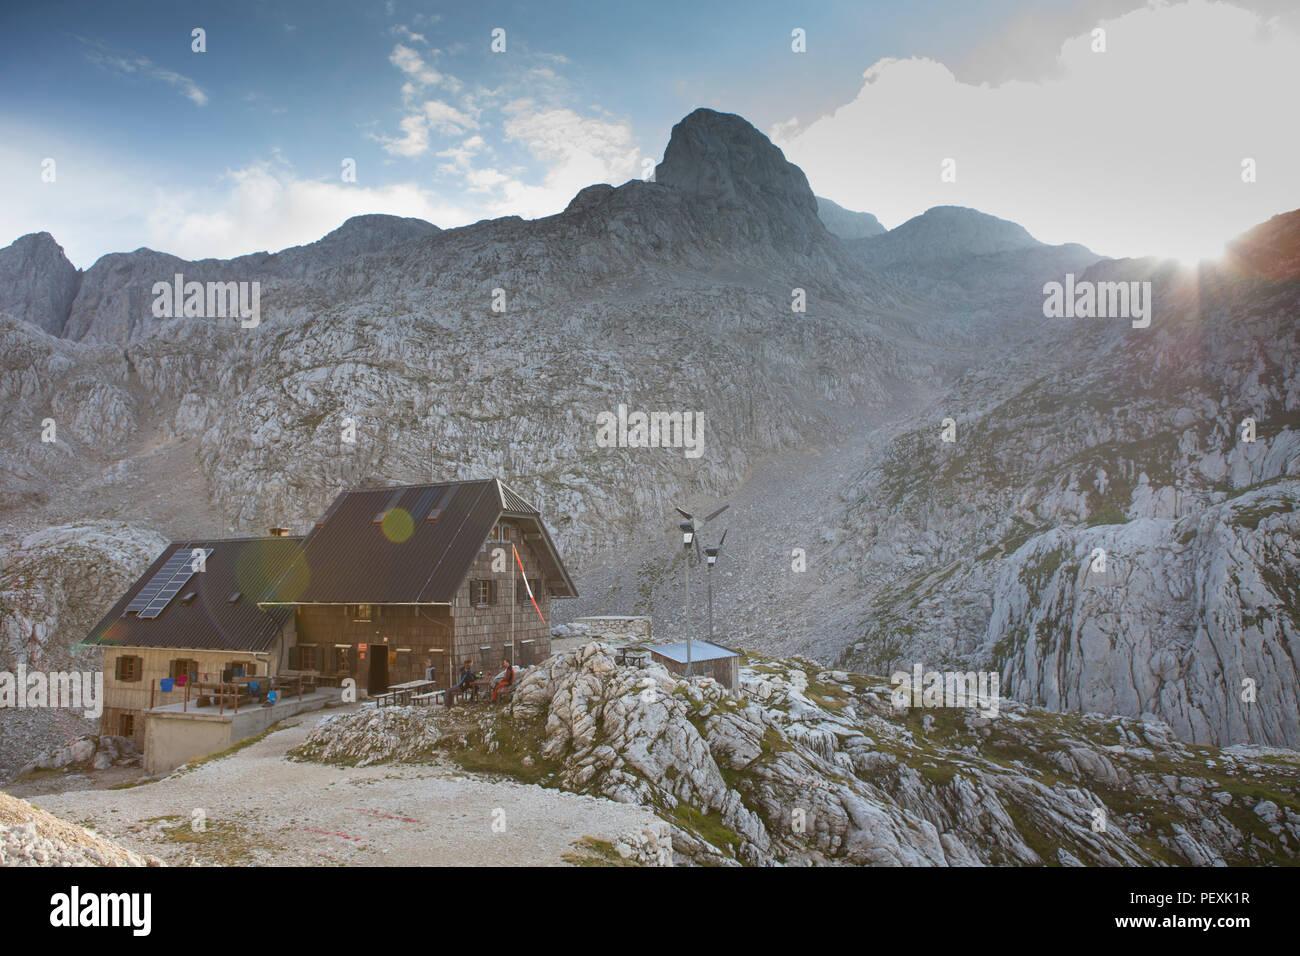 Mountain hut in Triglav National Park, Slovenia - Stock Image